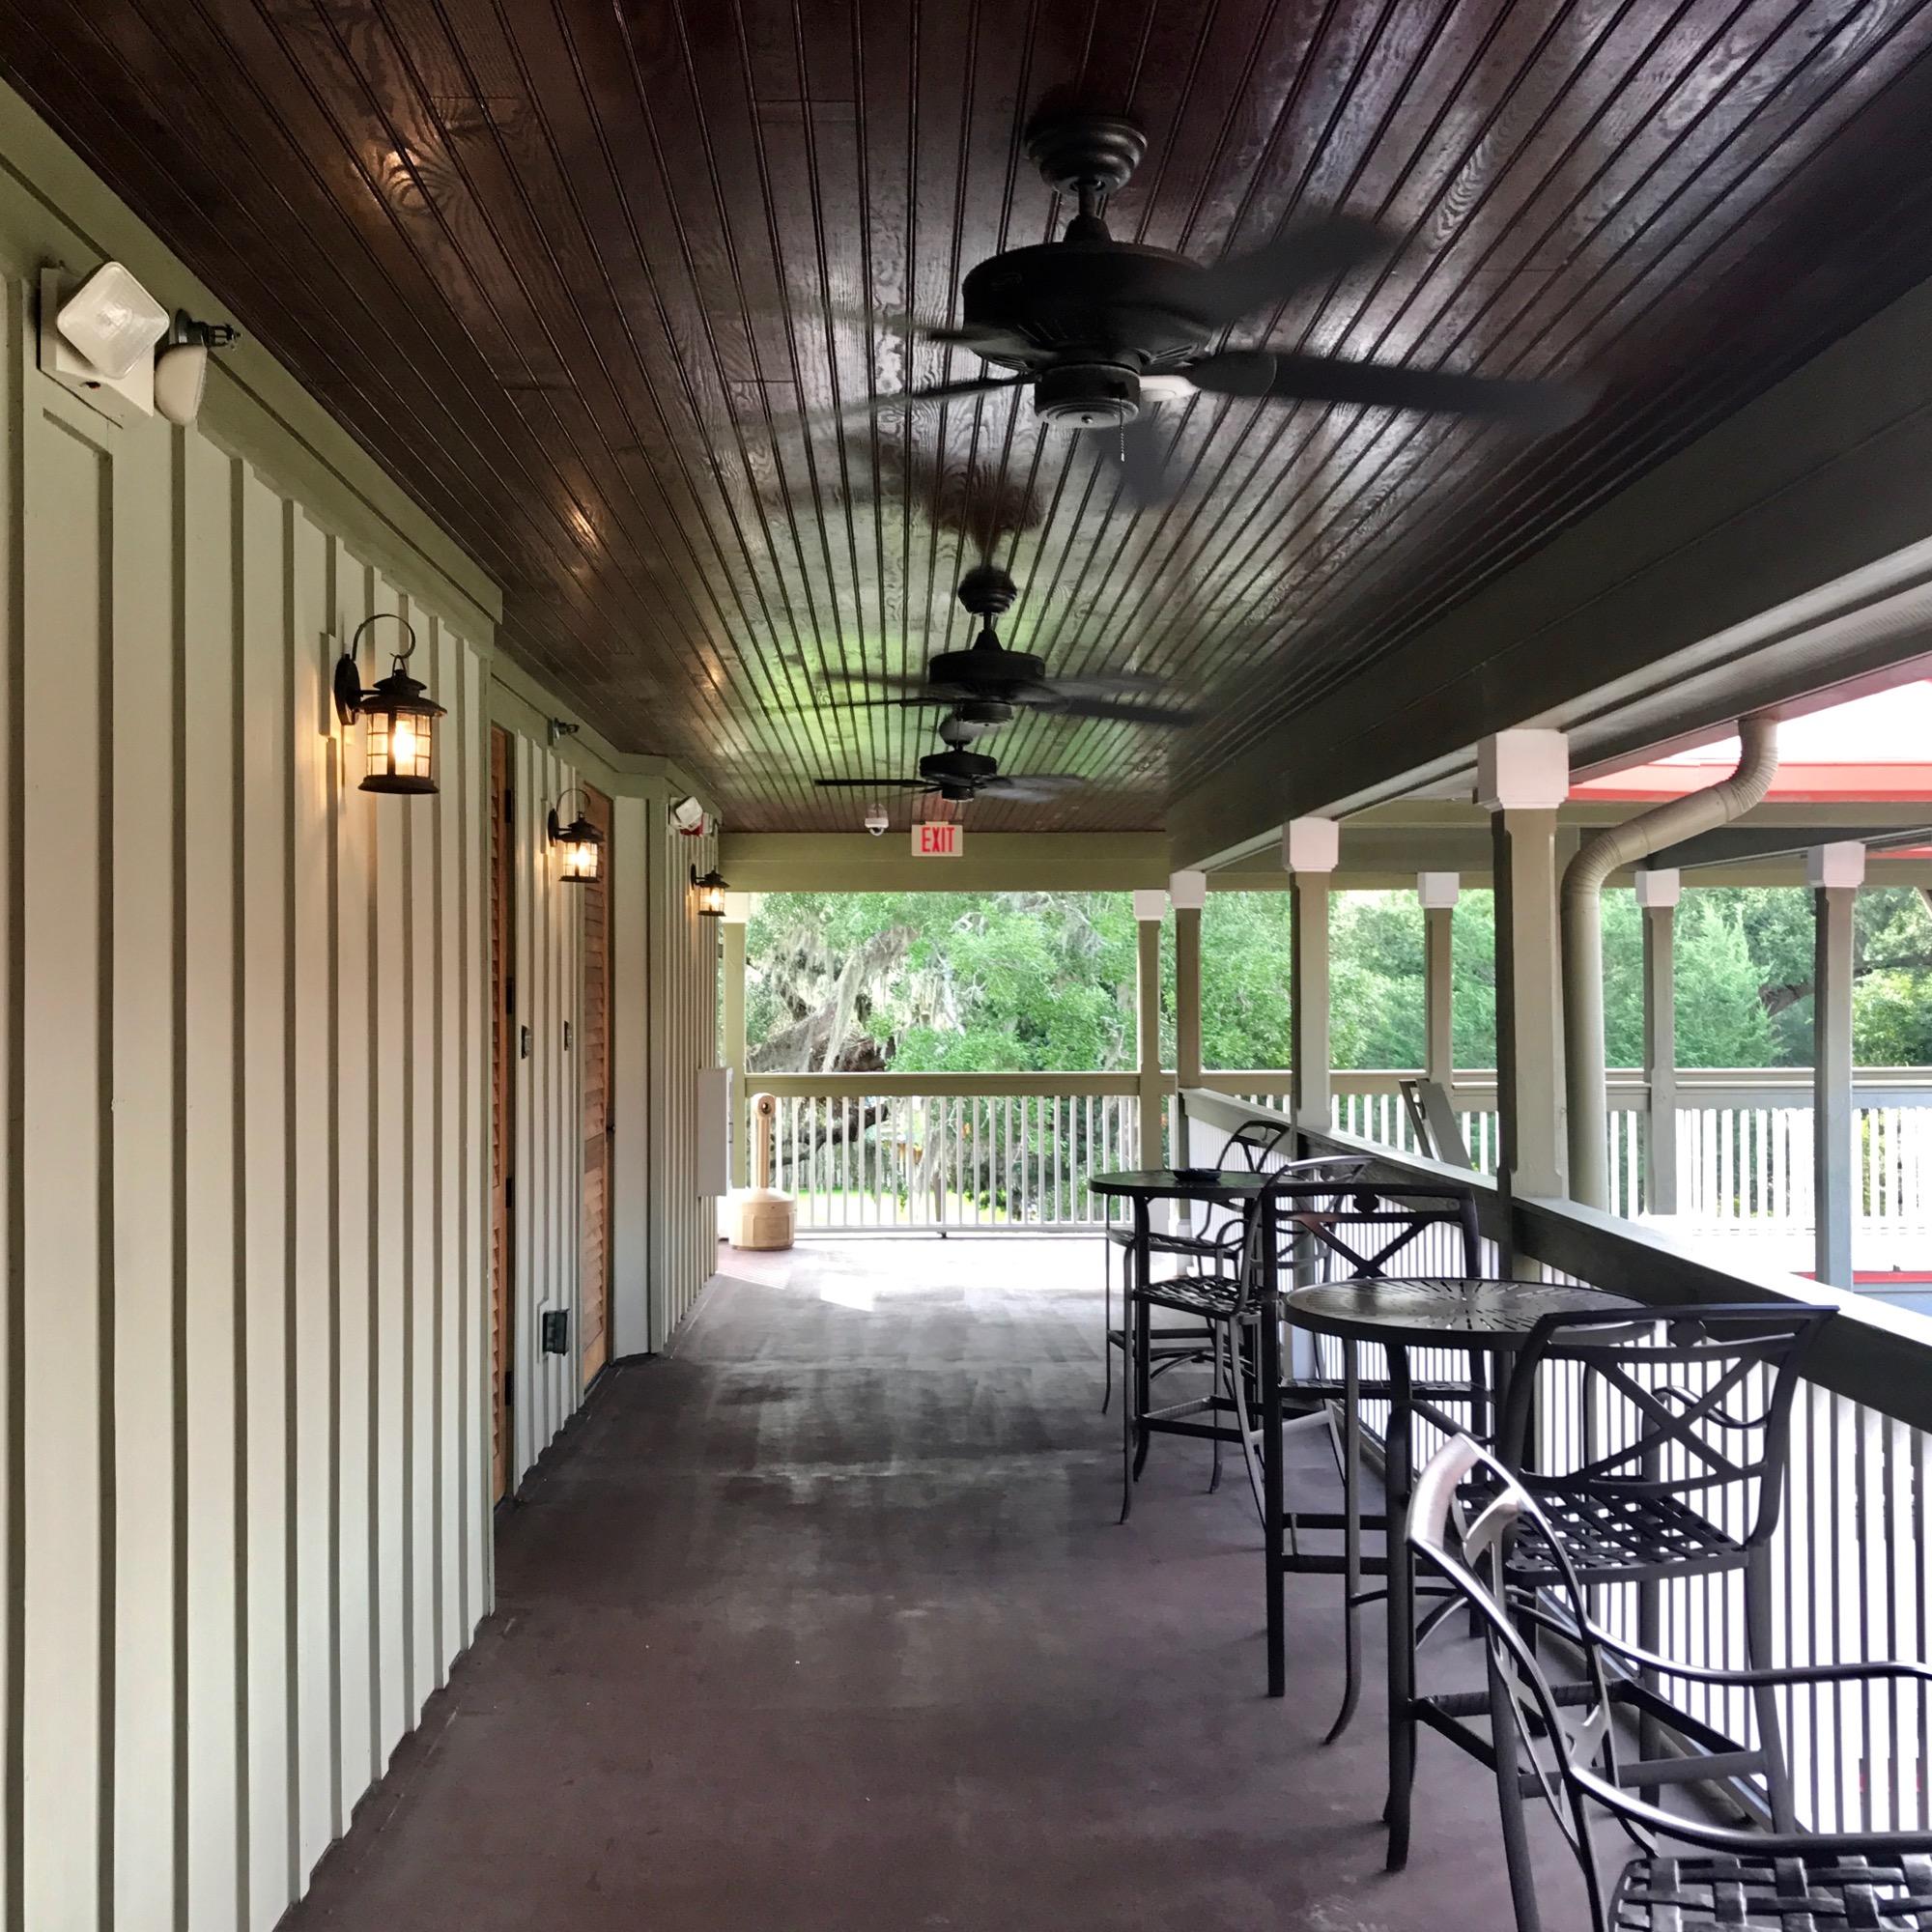 Five Fun Things To Do On South Carolina's Hammock Coast